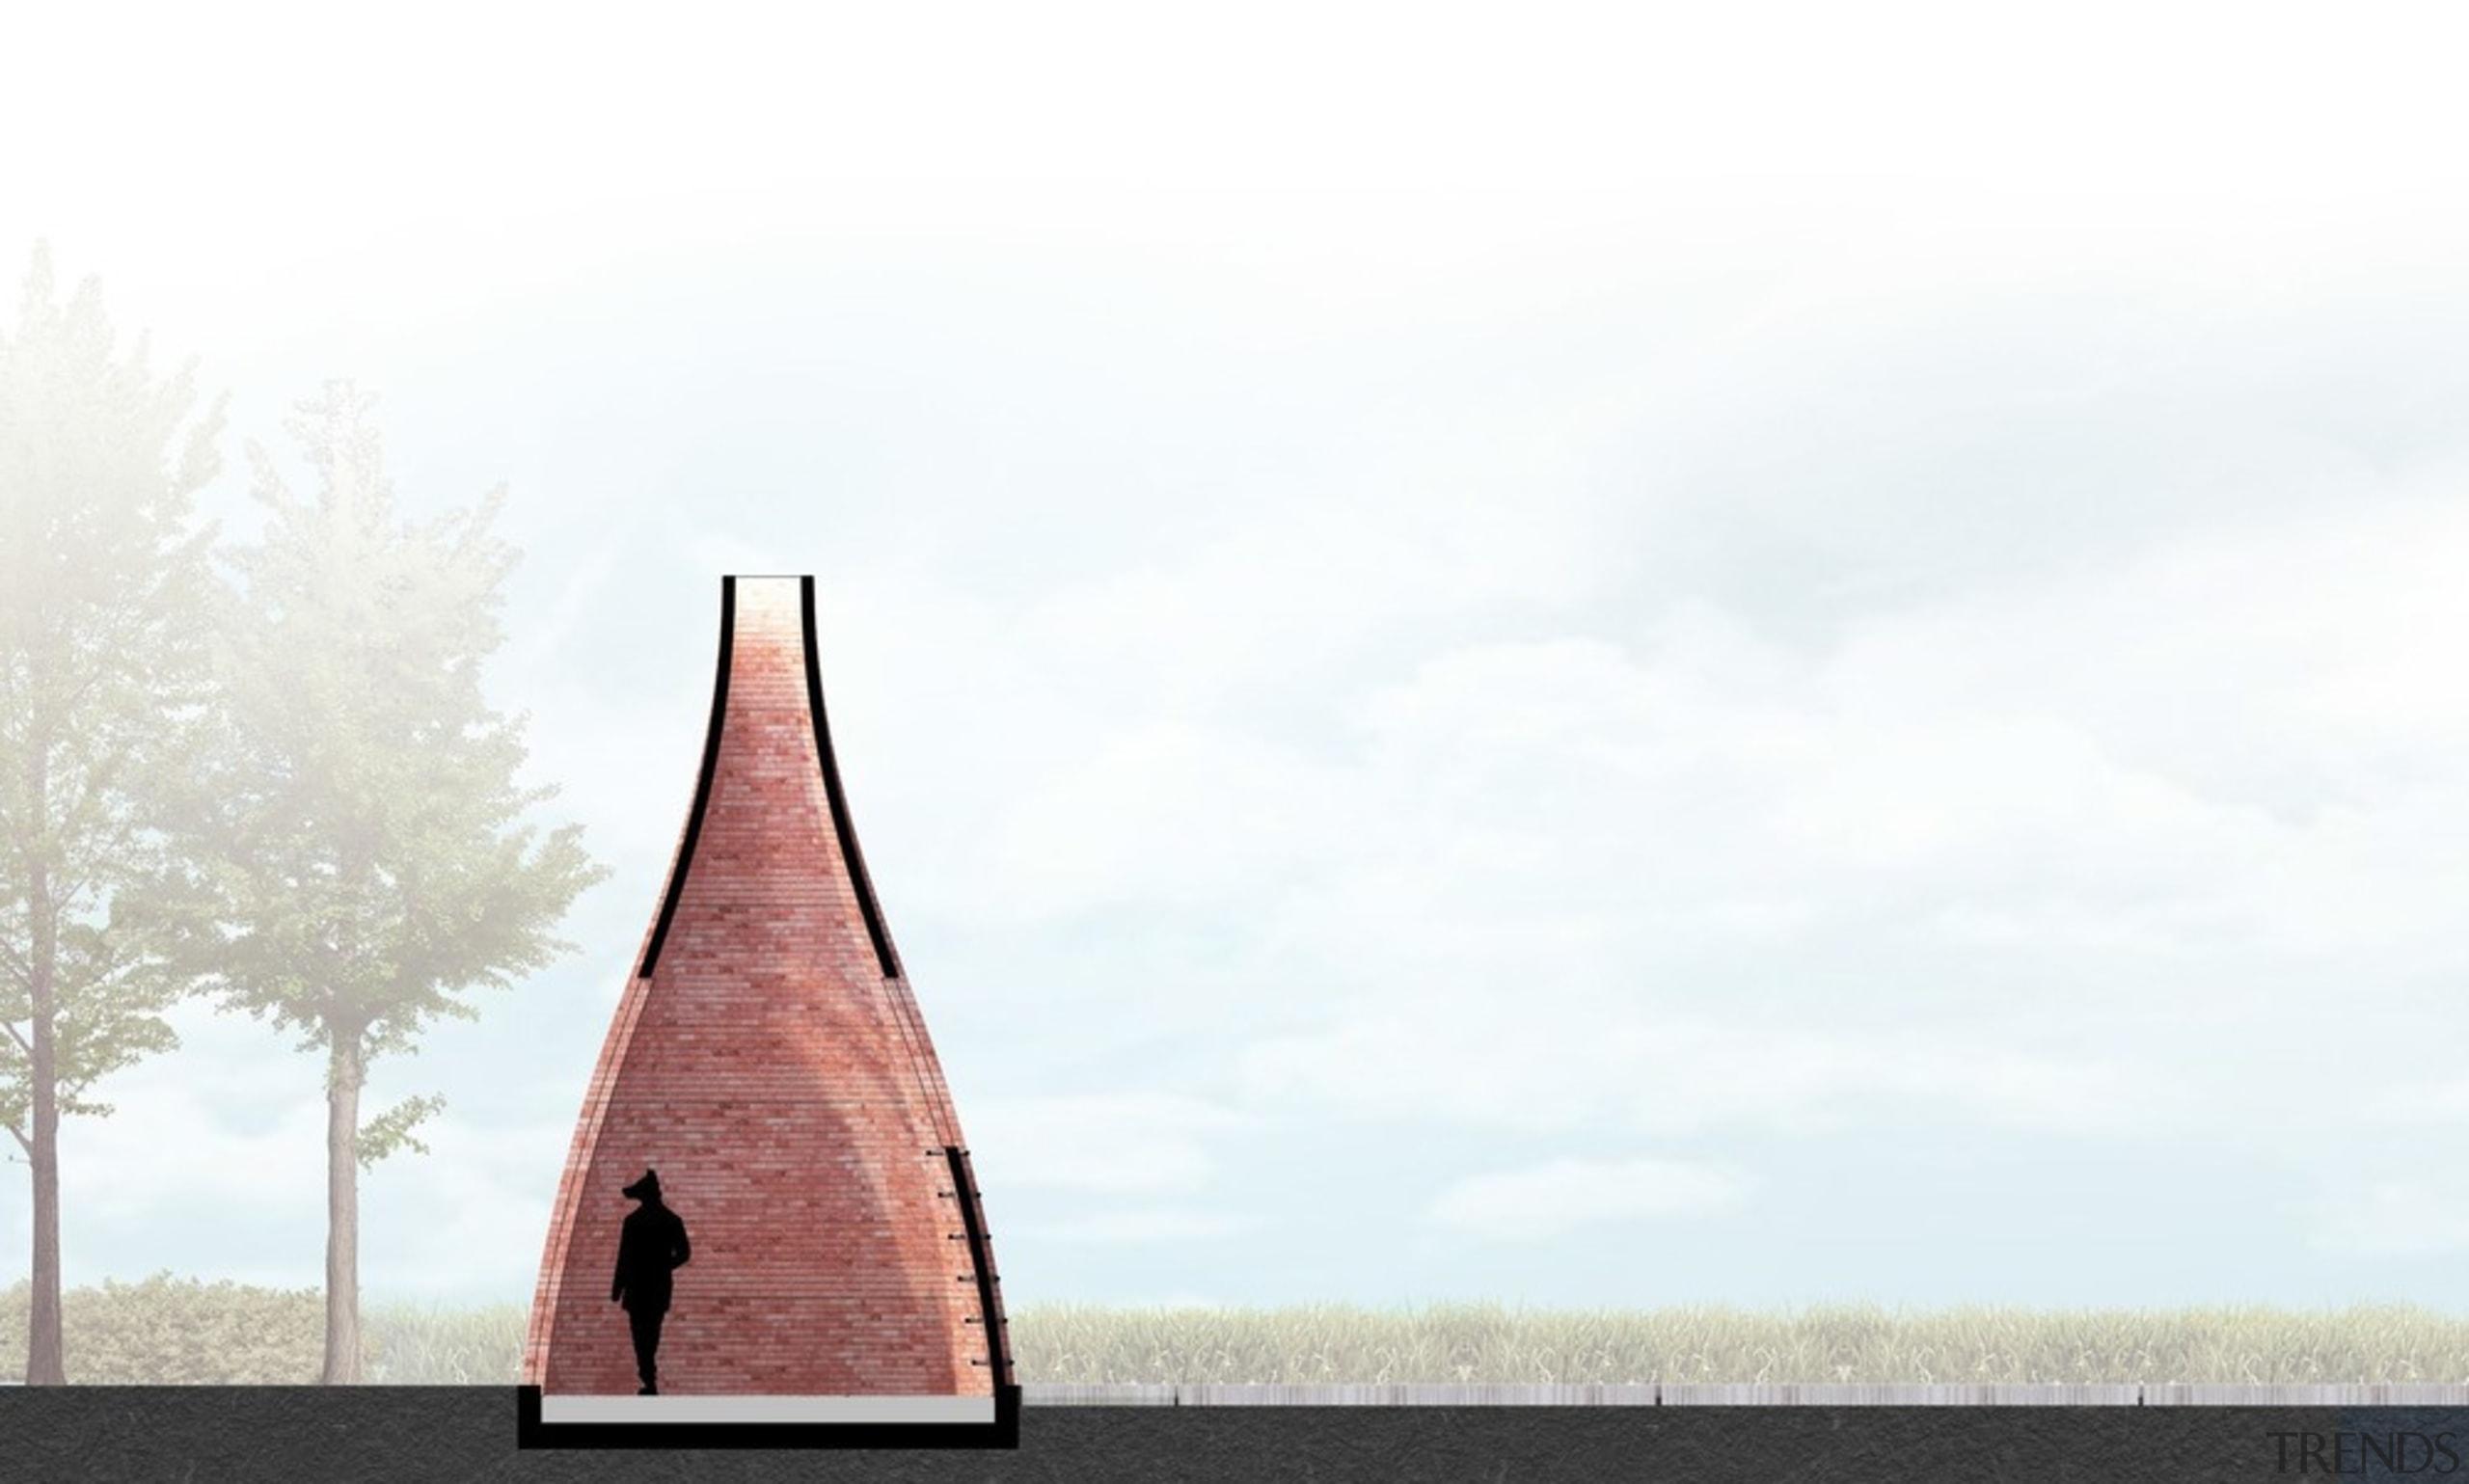 """Le dernier petit cochon"" or ""The last one architecture, sky, steeple, tree, white"